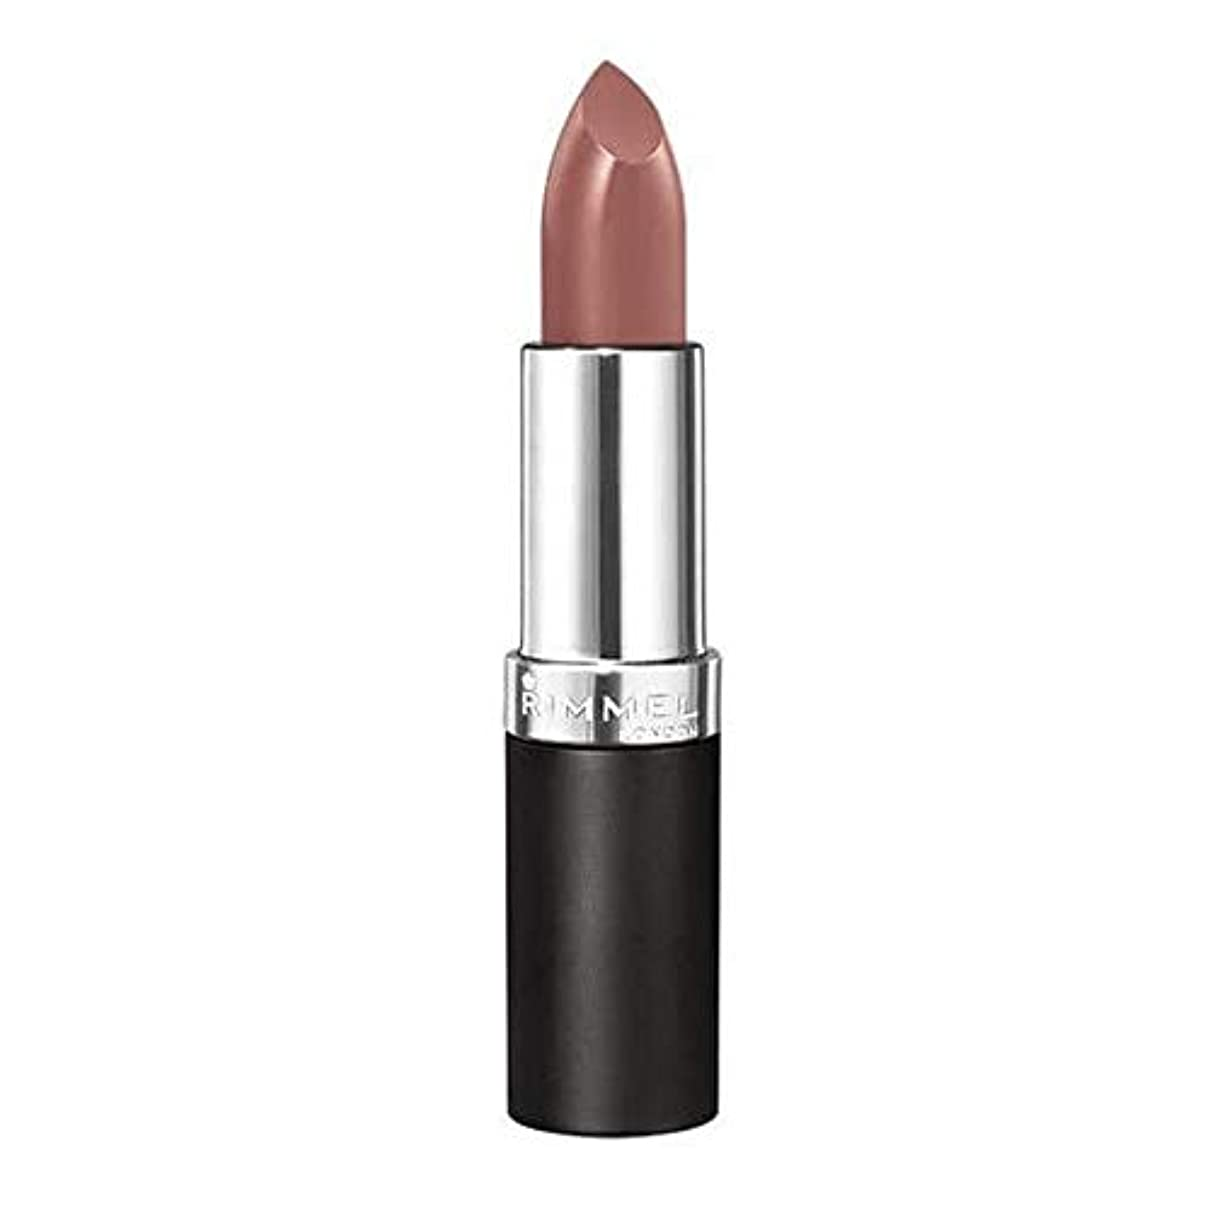 [Rimmel ] 仕上げの口紅を持続リンメルが汚れます - Rimmel Lasting Finish Lipstick Get Dirty [並行輸入品]